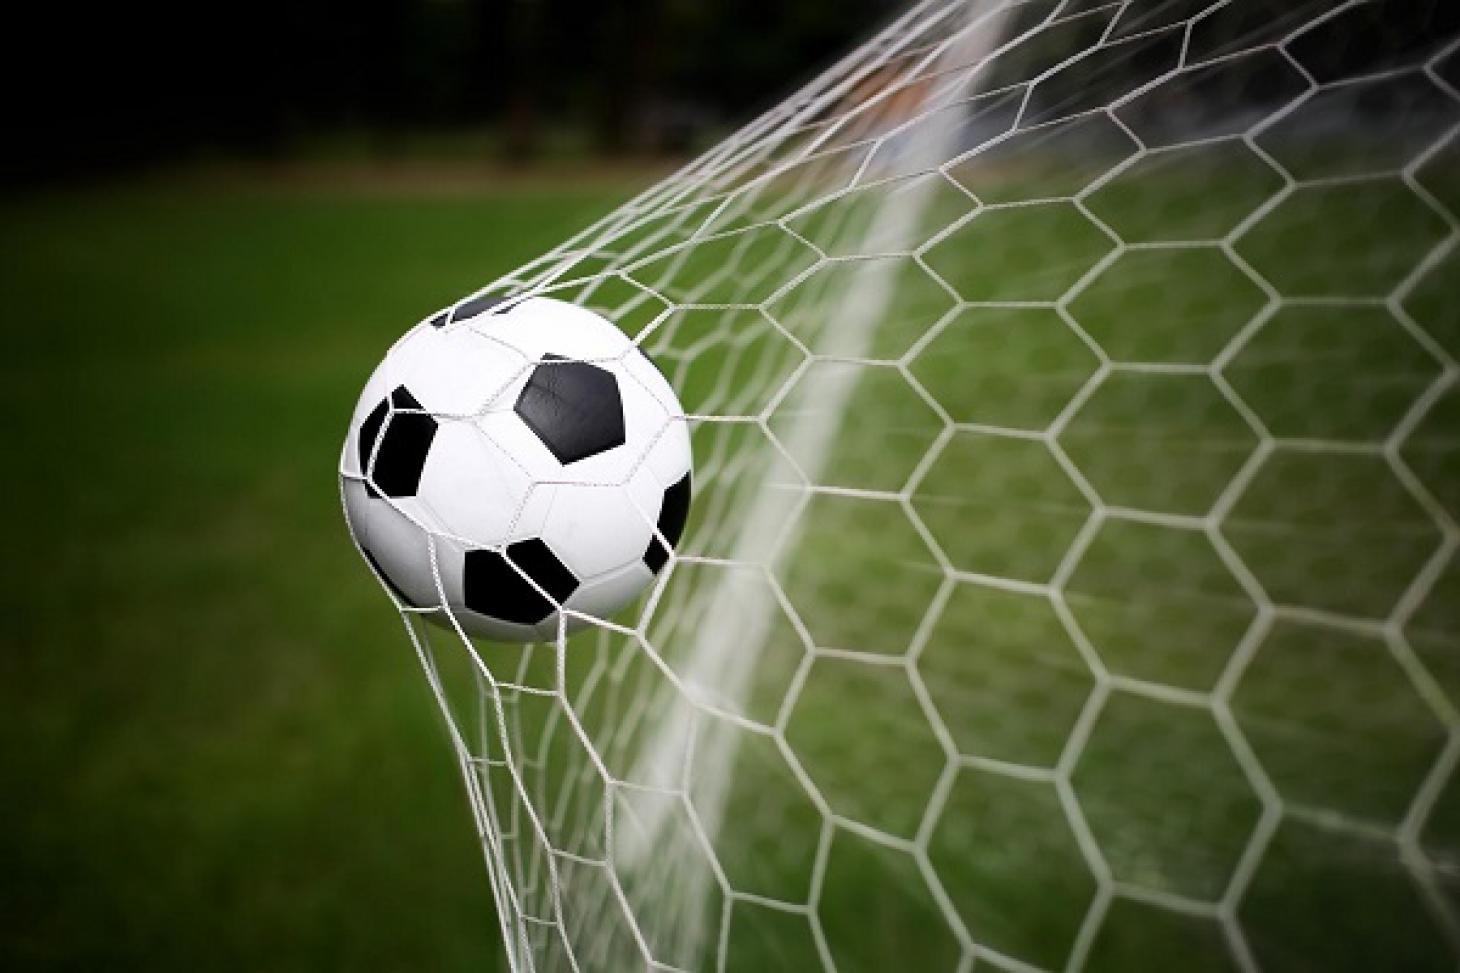 Marlay Park 11 a side | Grass football pitch